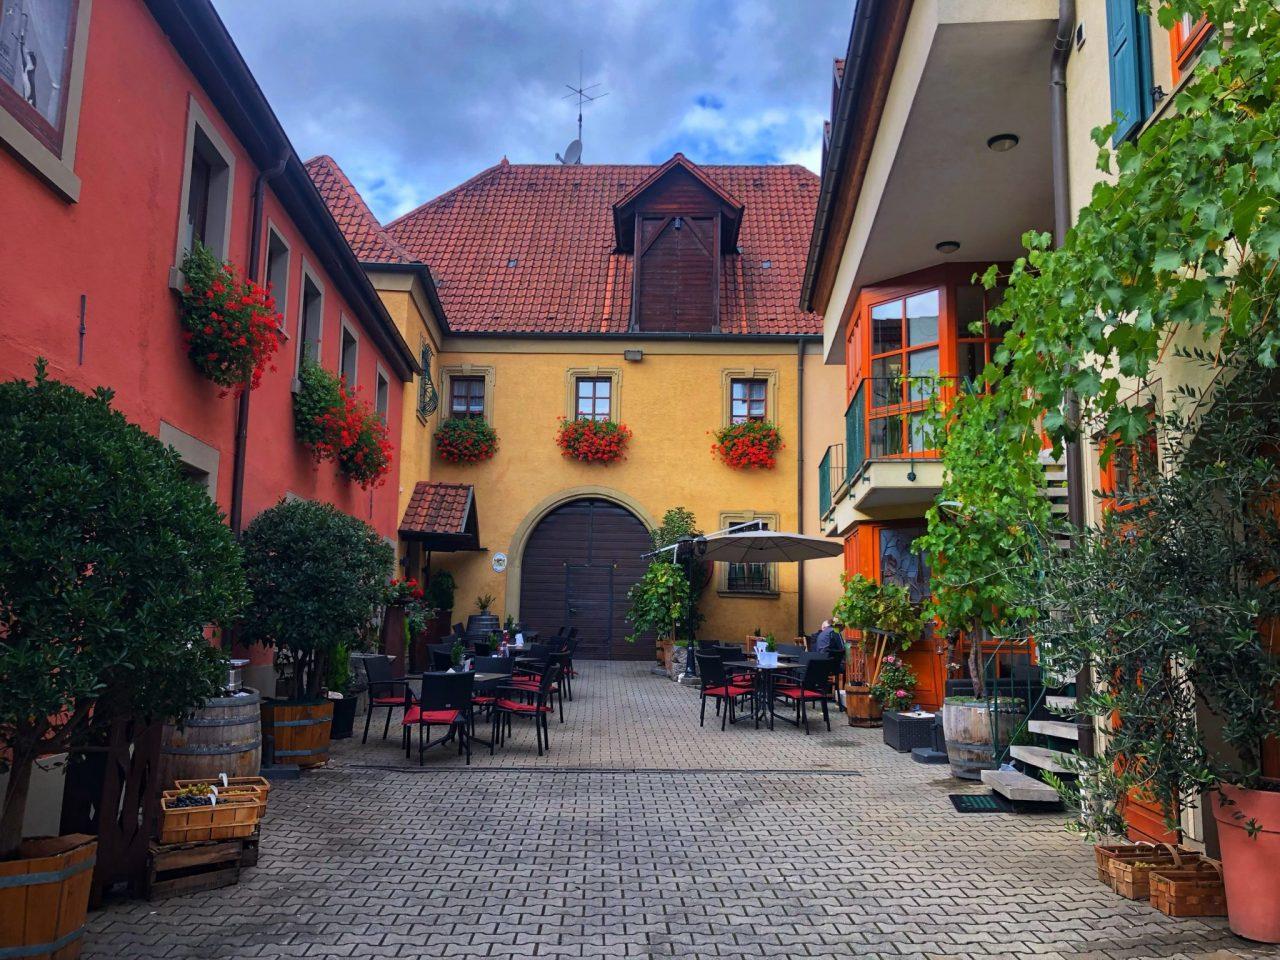 Sommerach Vintner courtyard, Franconia